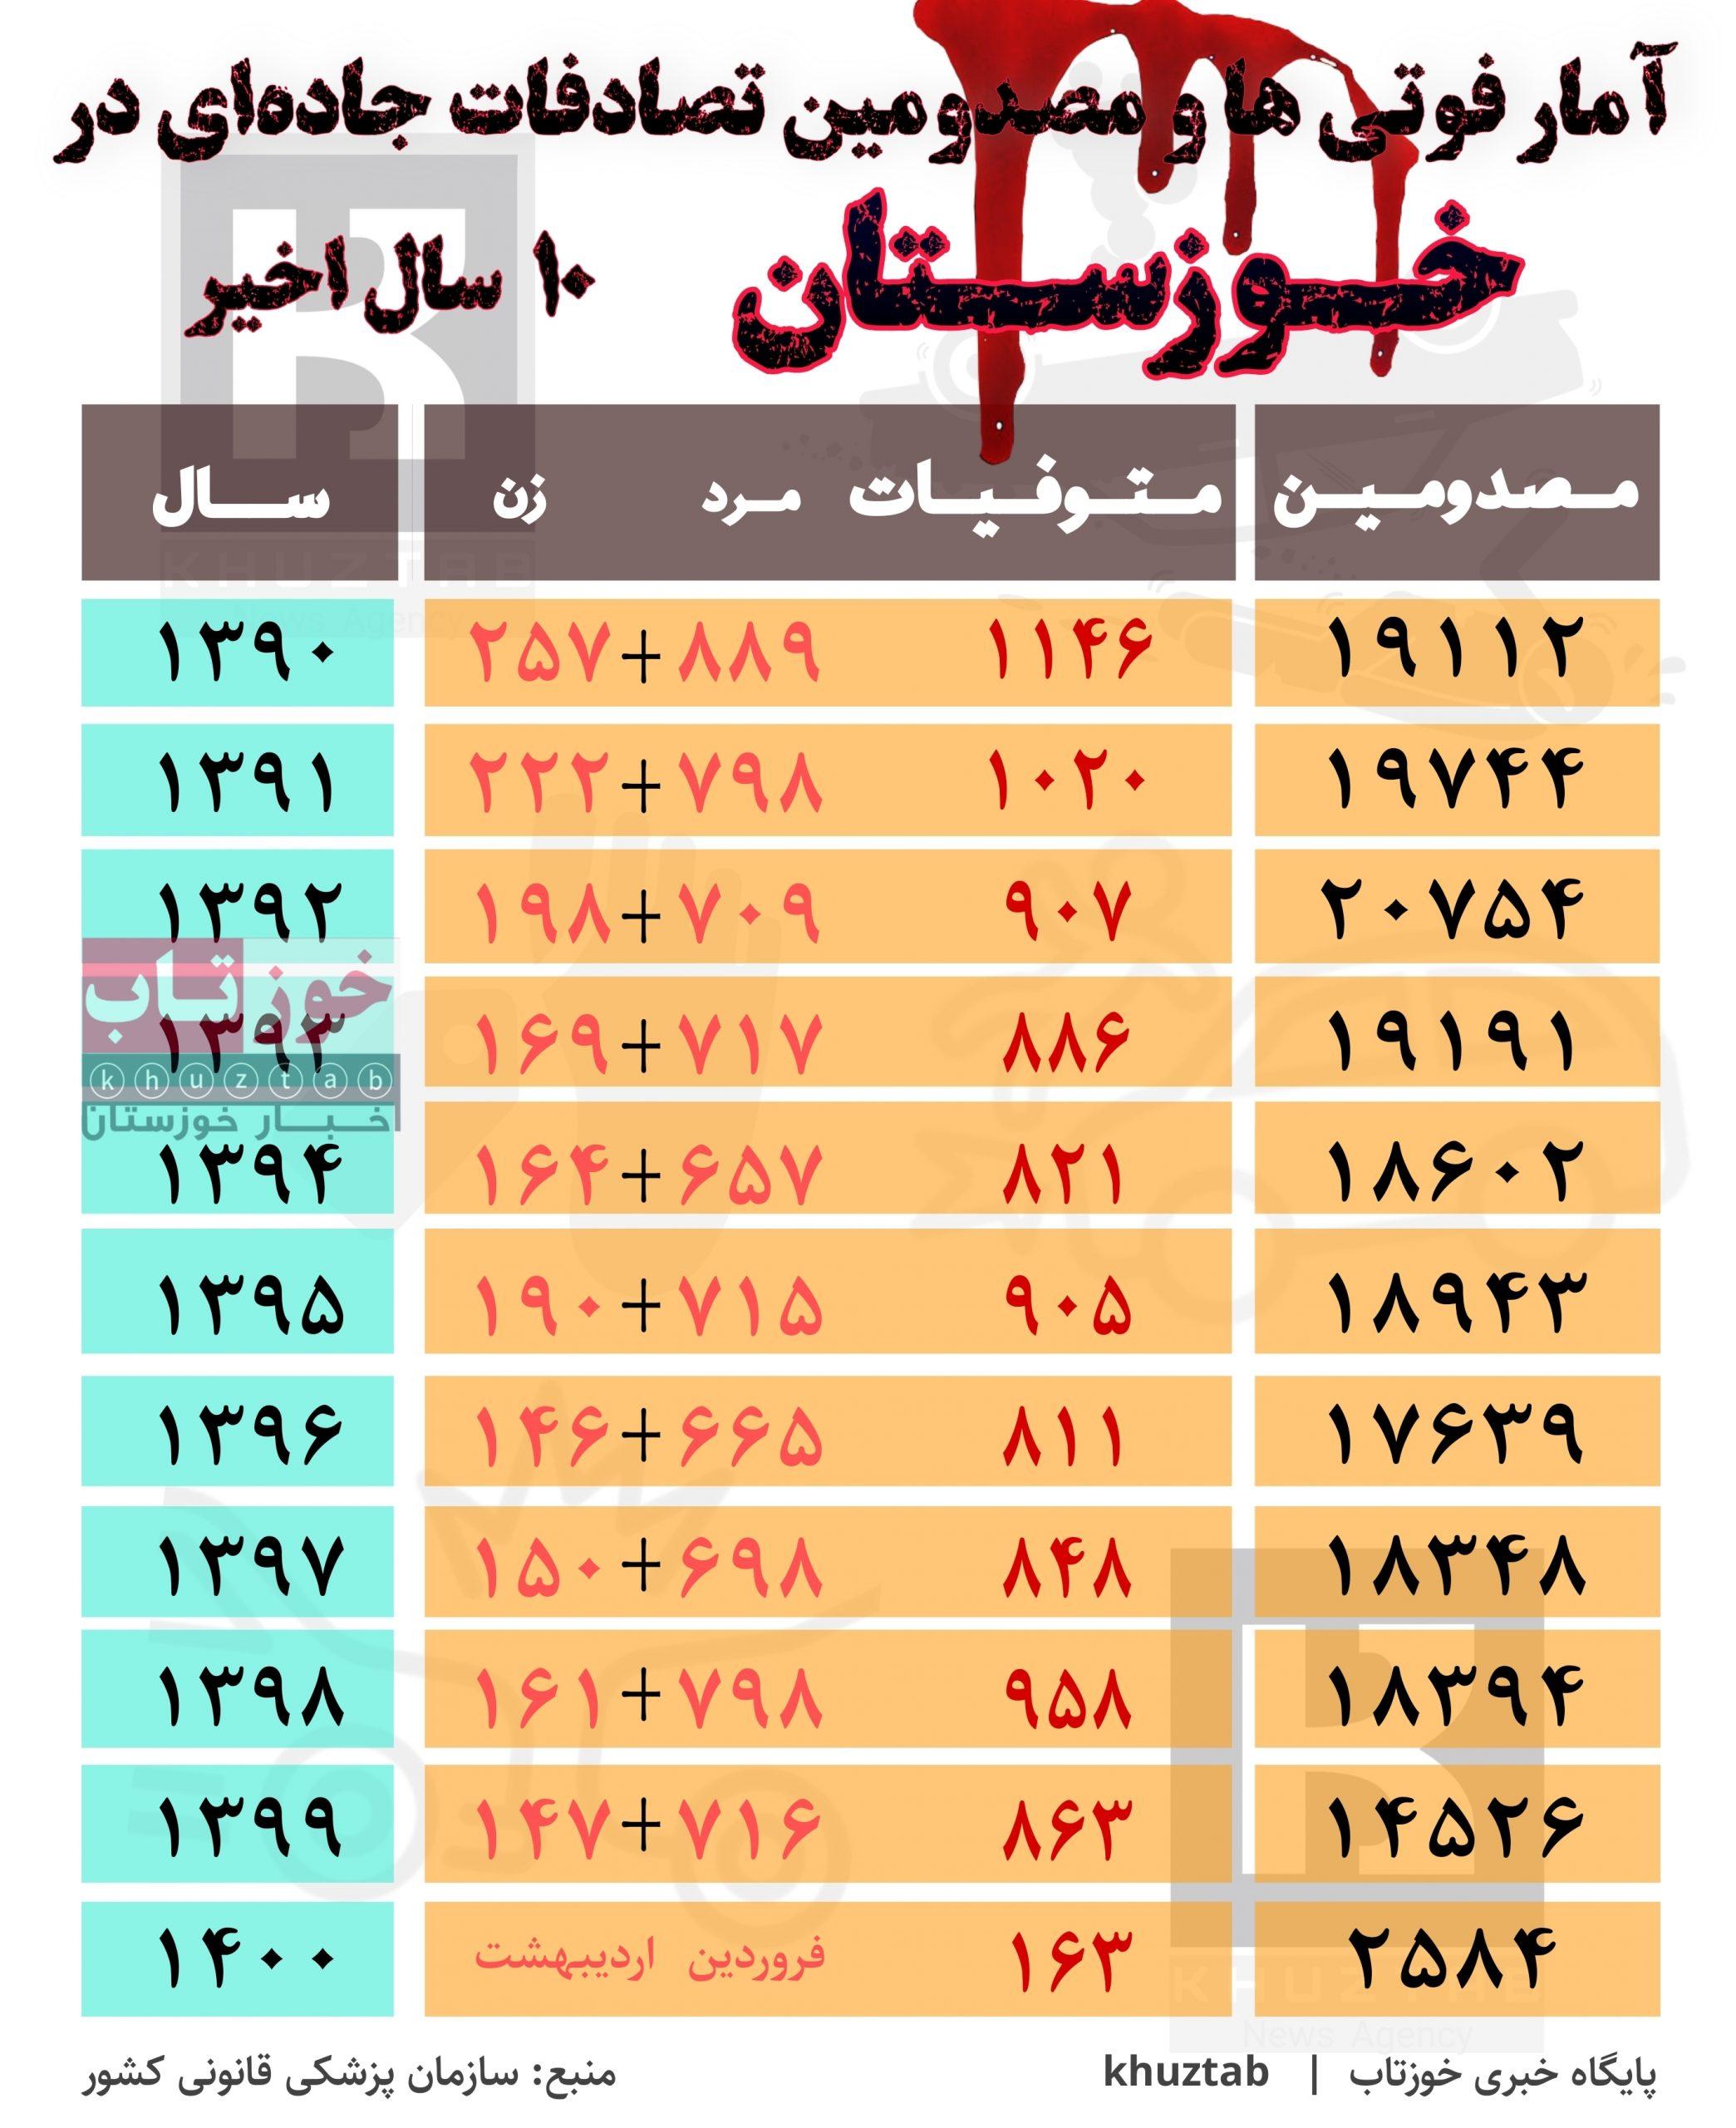 PicsArt 07 17 05.51.25 scaled آمار فوتی ها و مصدومین تصادفات جاده ای در خوزستان